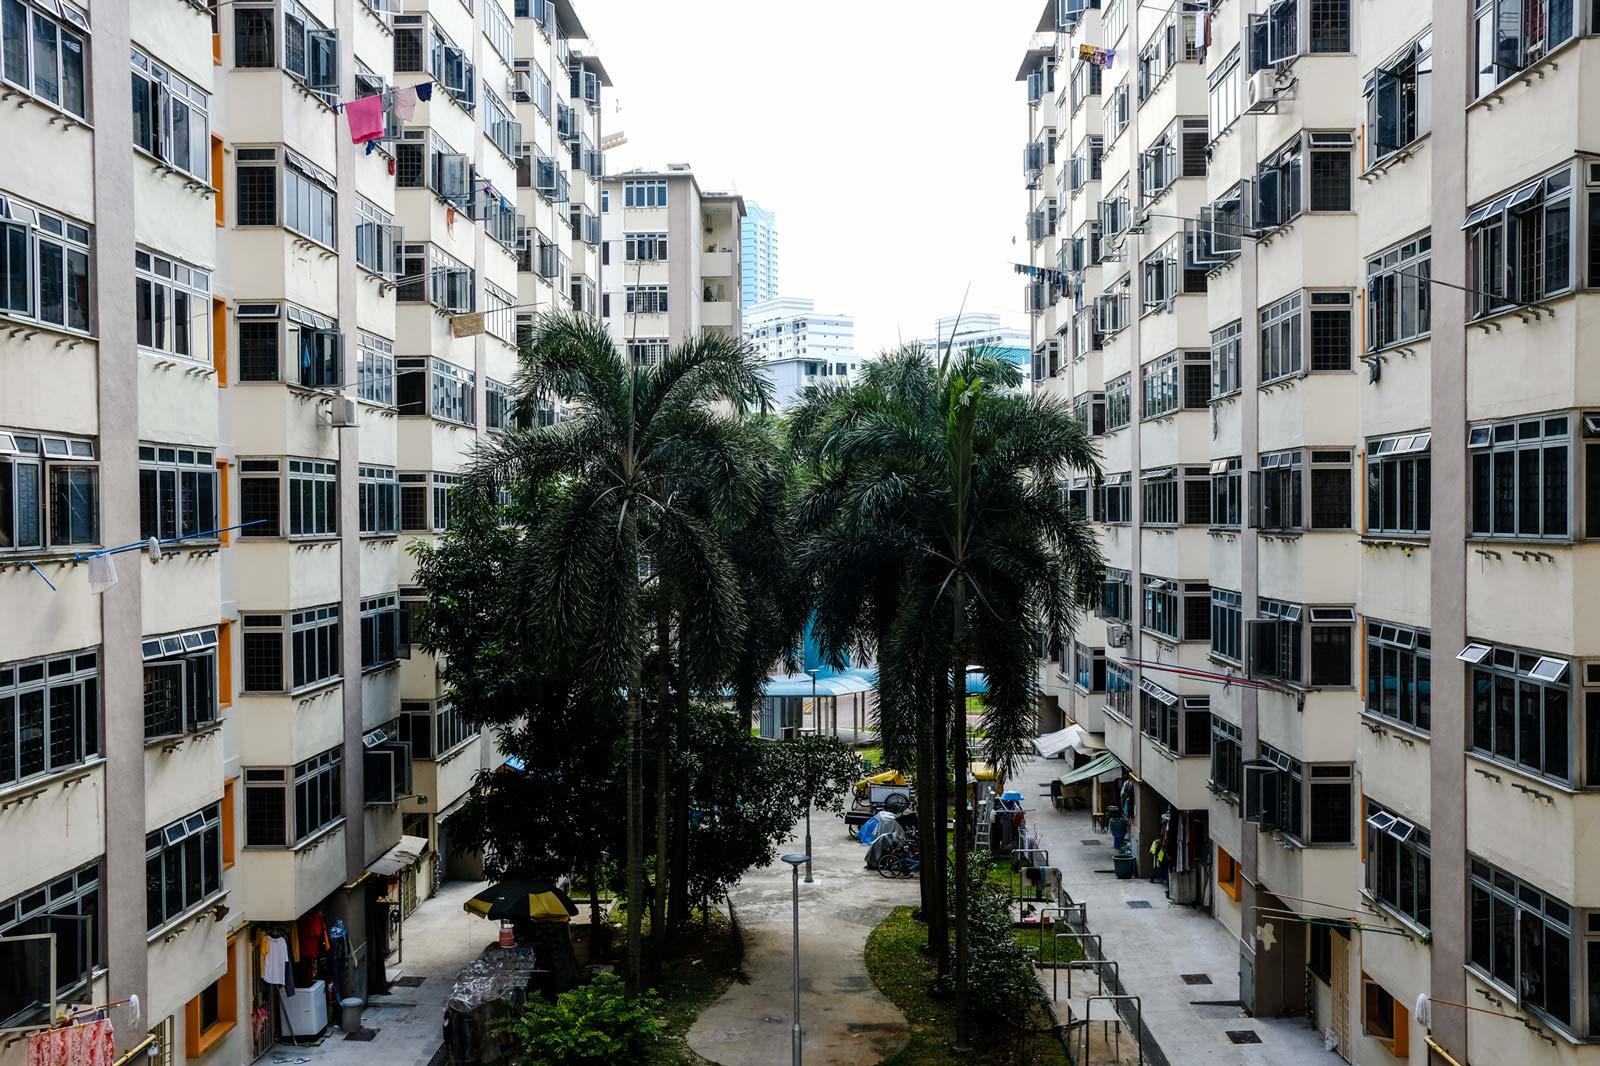 Singapore's working poor hit hardest by economic shutdown